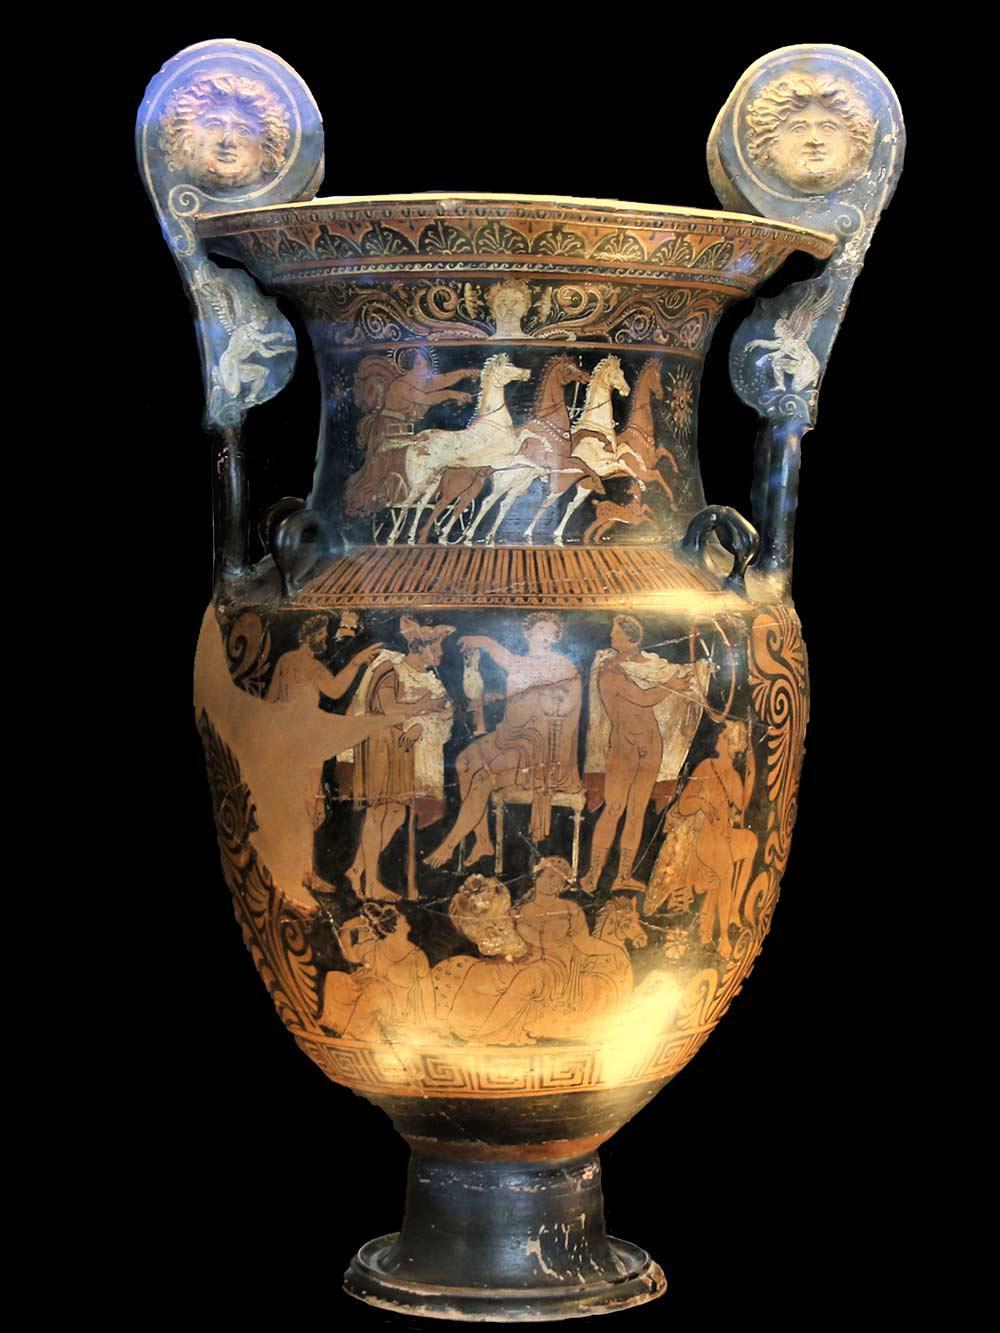 Helios et Phaethon